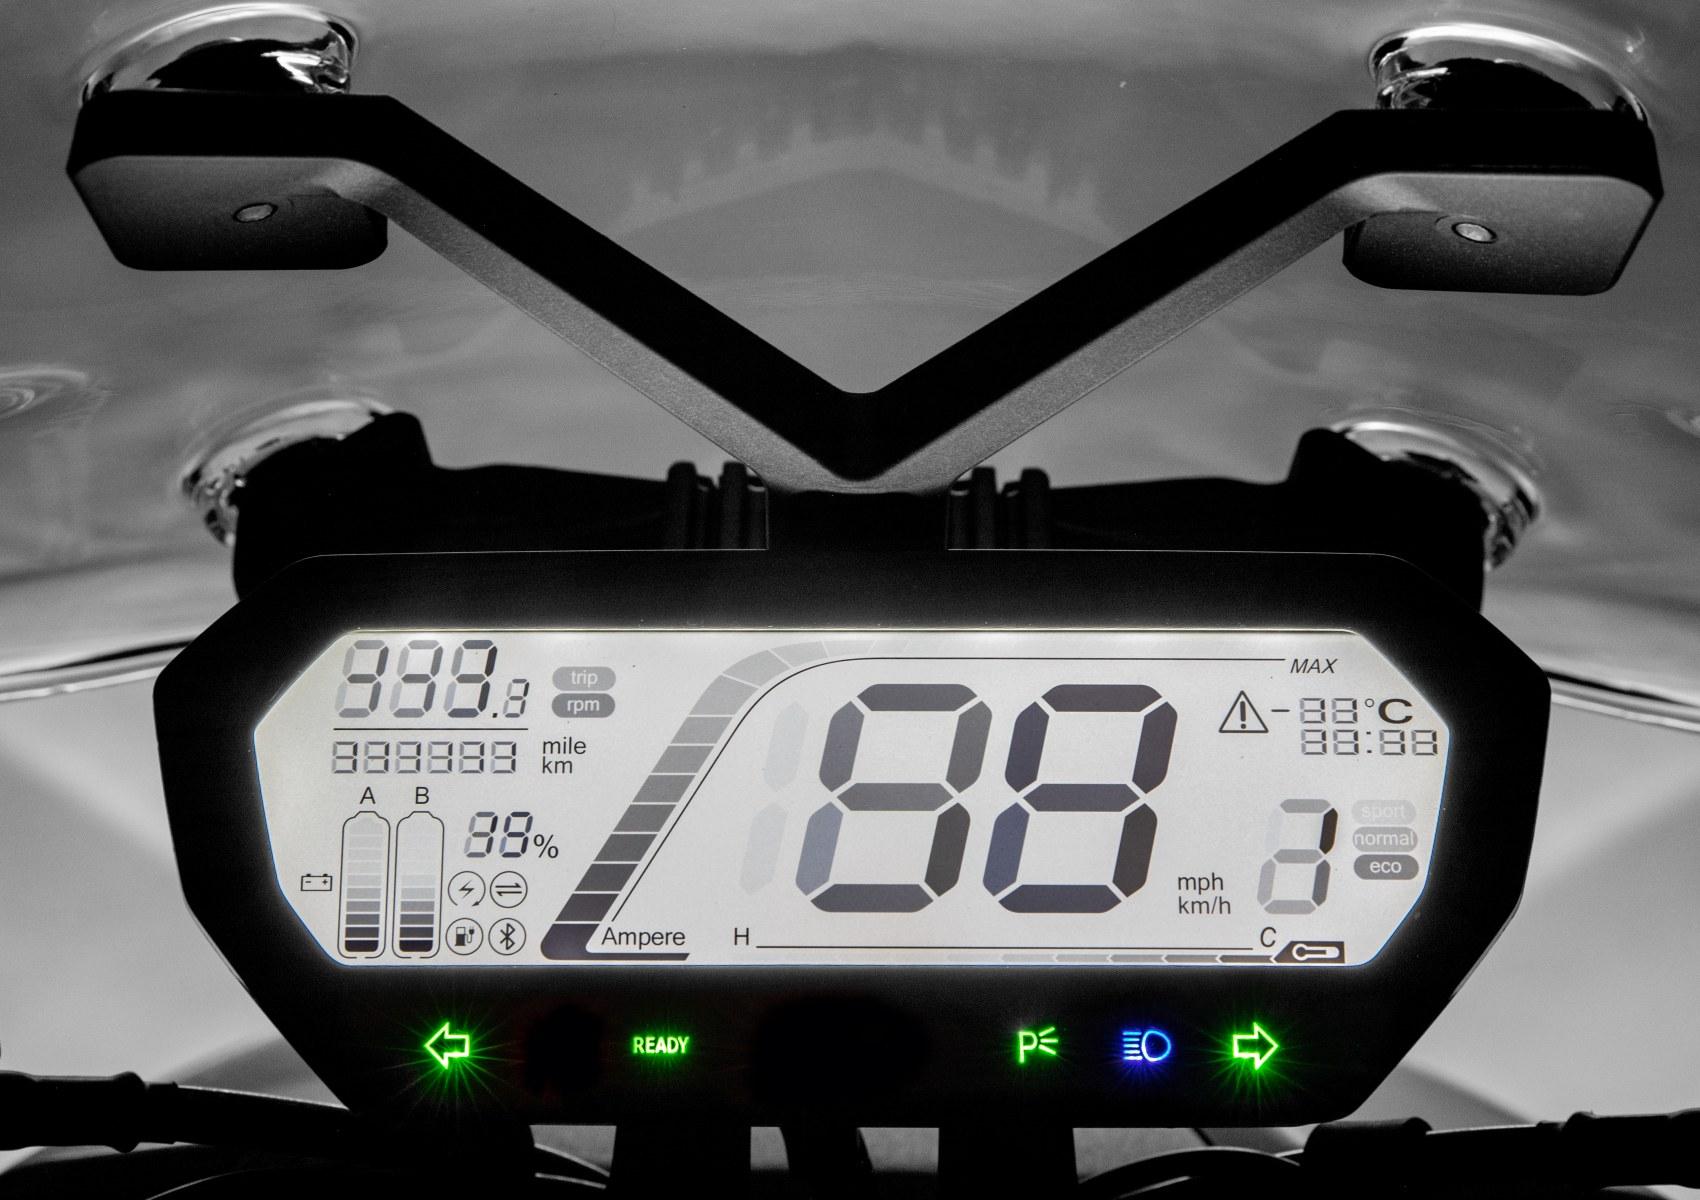 Super Soco CPx electric scooter digital disply dash